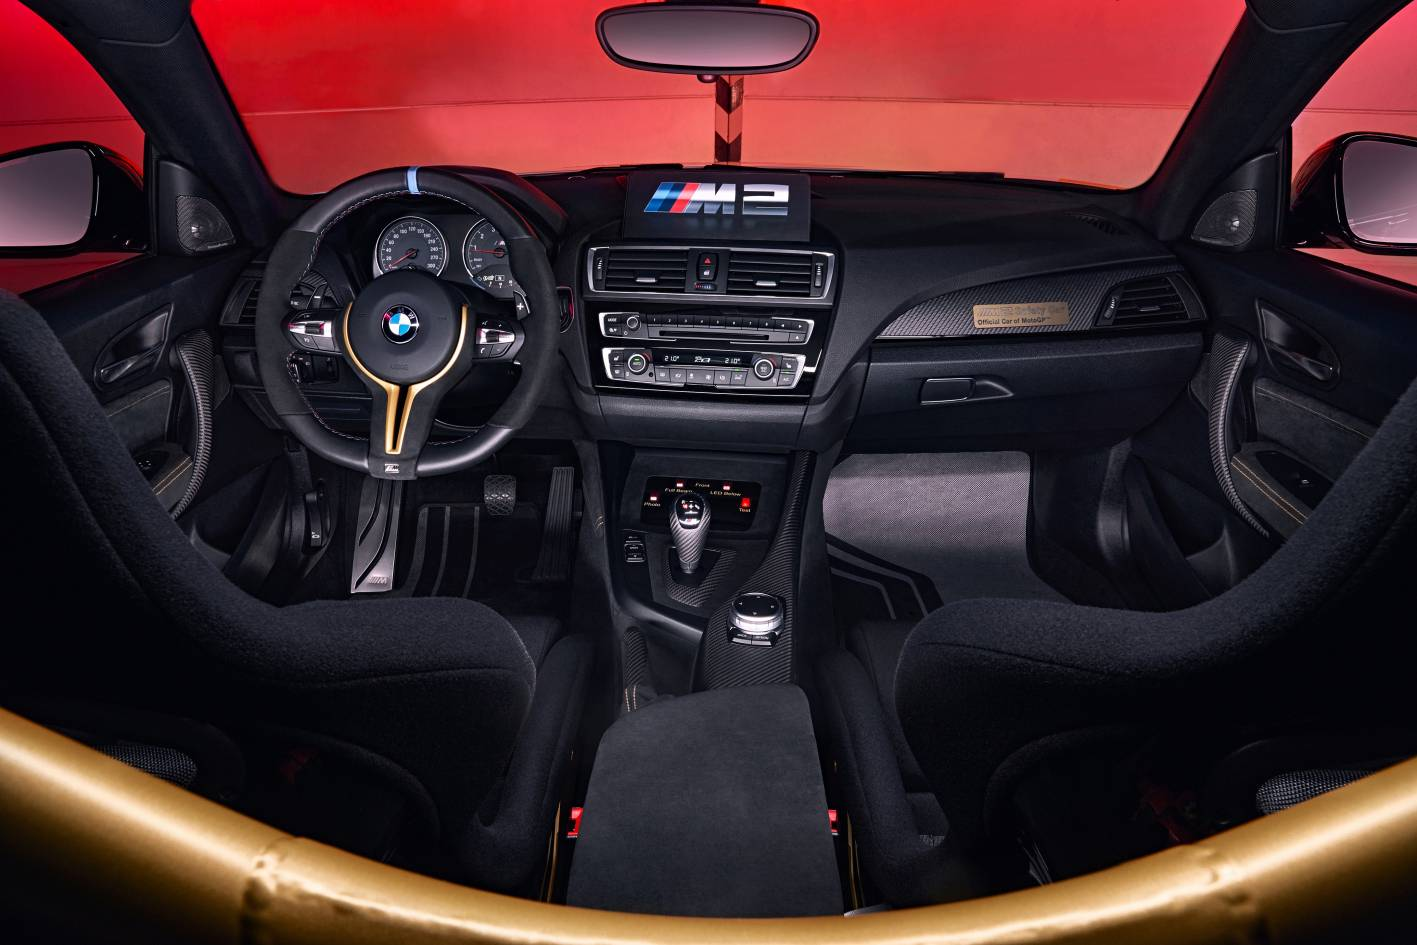 Bmw M2 Announced As 2016 Motogp Safety Car Forcegt Com